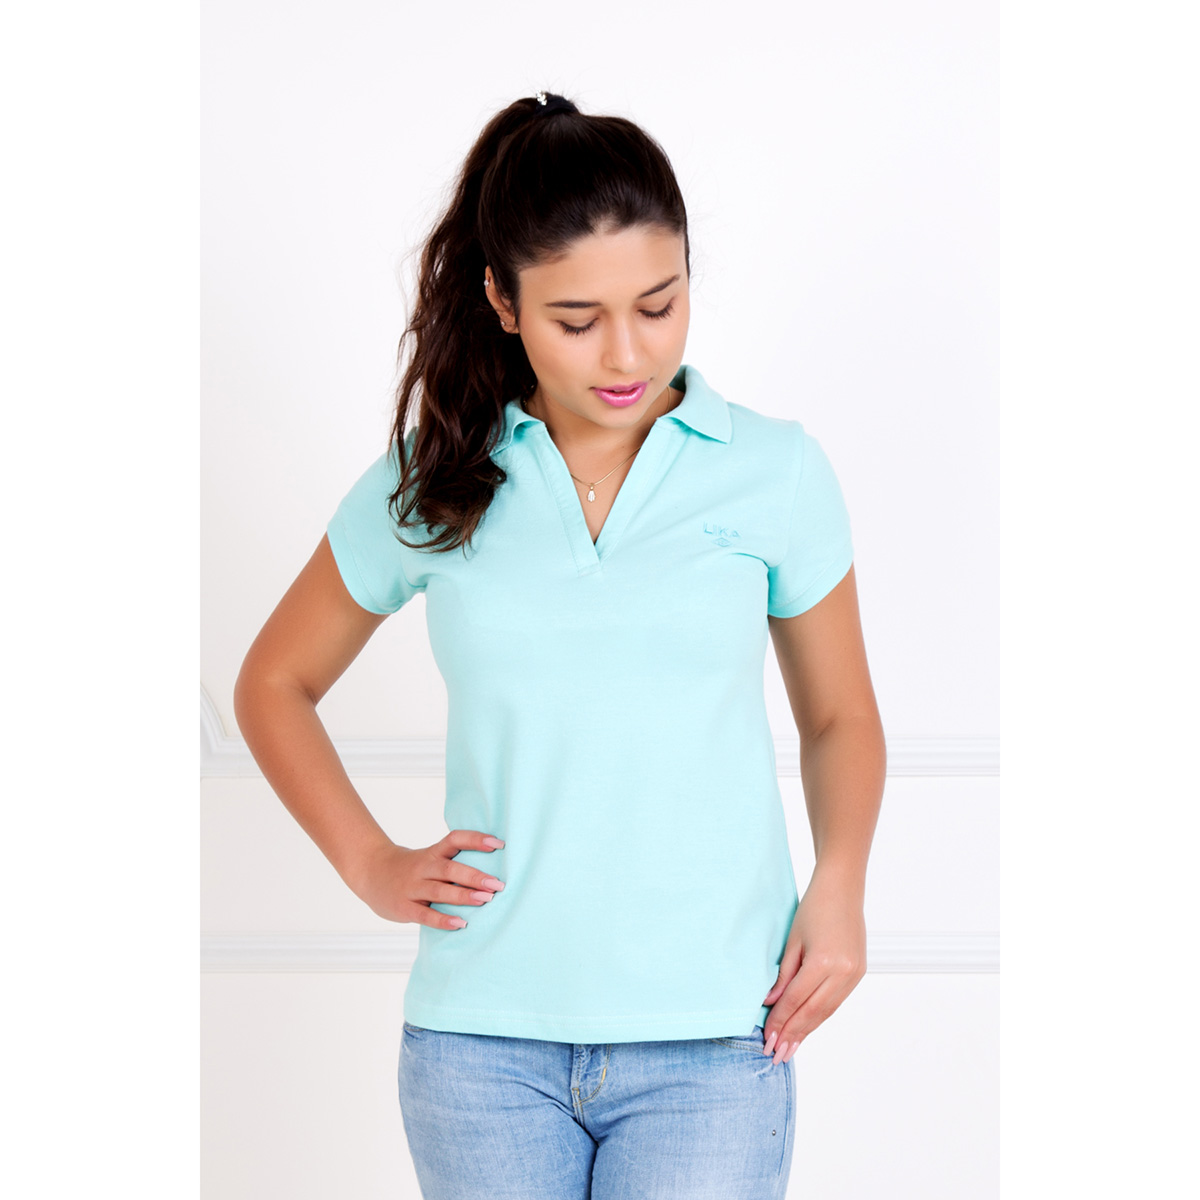 Женская футболка-поло Шерт Ментол, размер 50Блузки, майки, кофты<br>Обхват груди:100 см<br>Обхват талии:82 см<br>Обхват бедер:108 см<br>Рост:167 см<br><br>Тип: Жен. футболка<br>Размер: 50<br>Материал: Пике